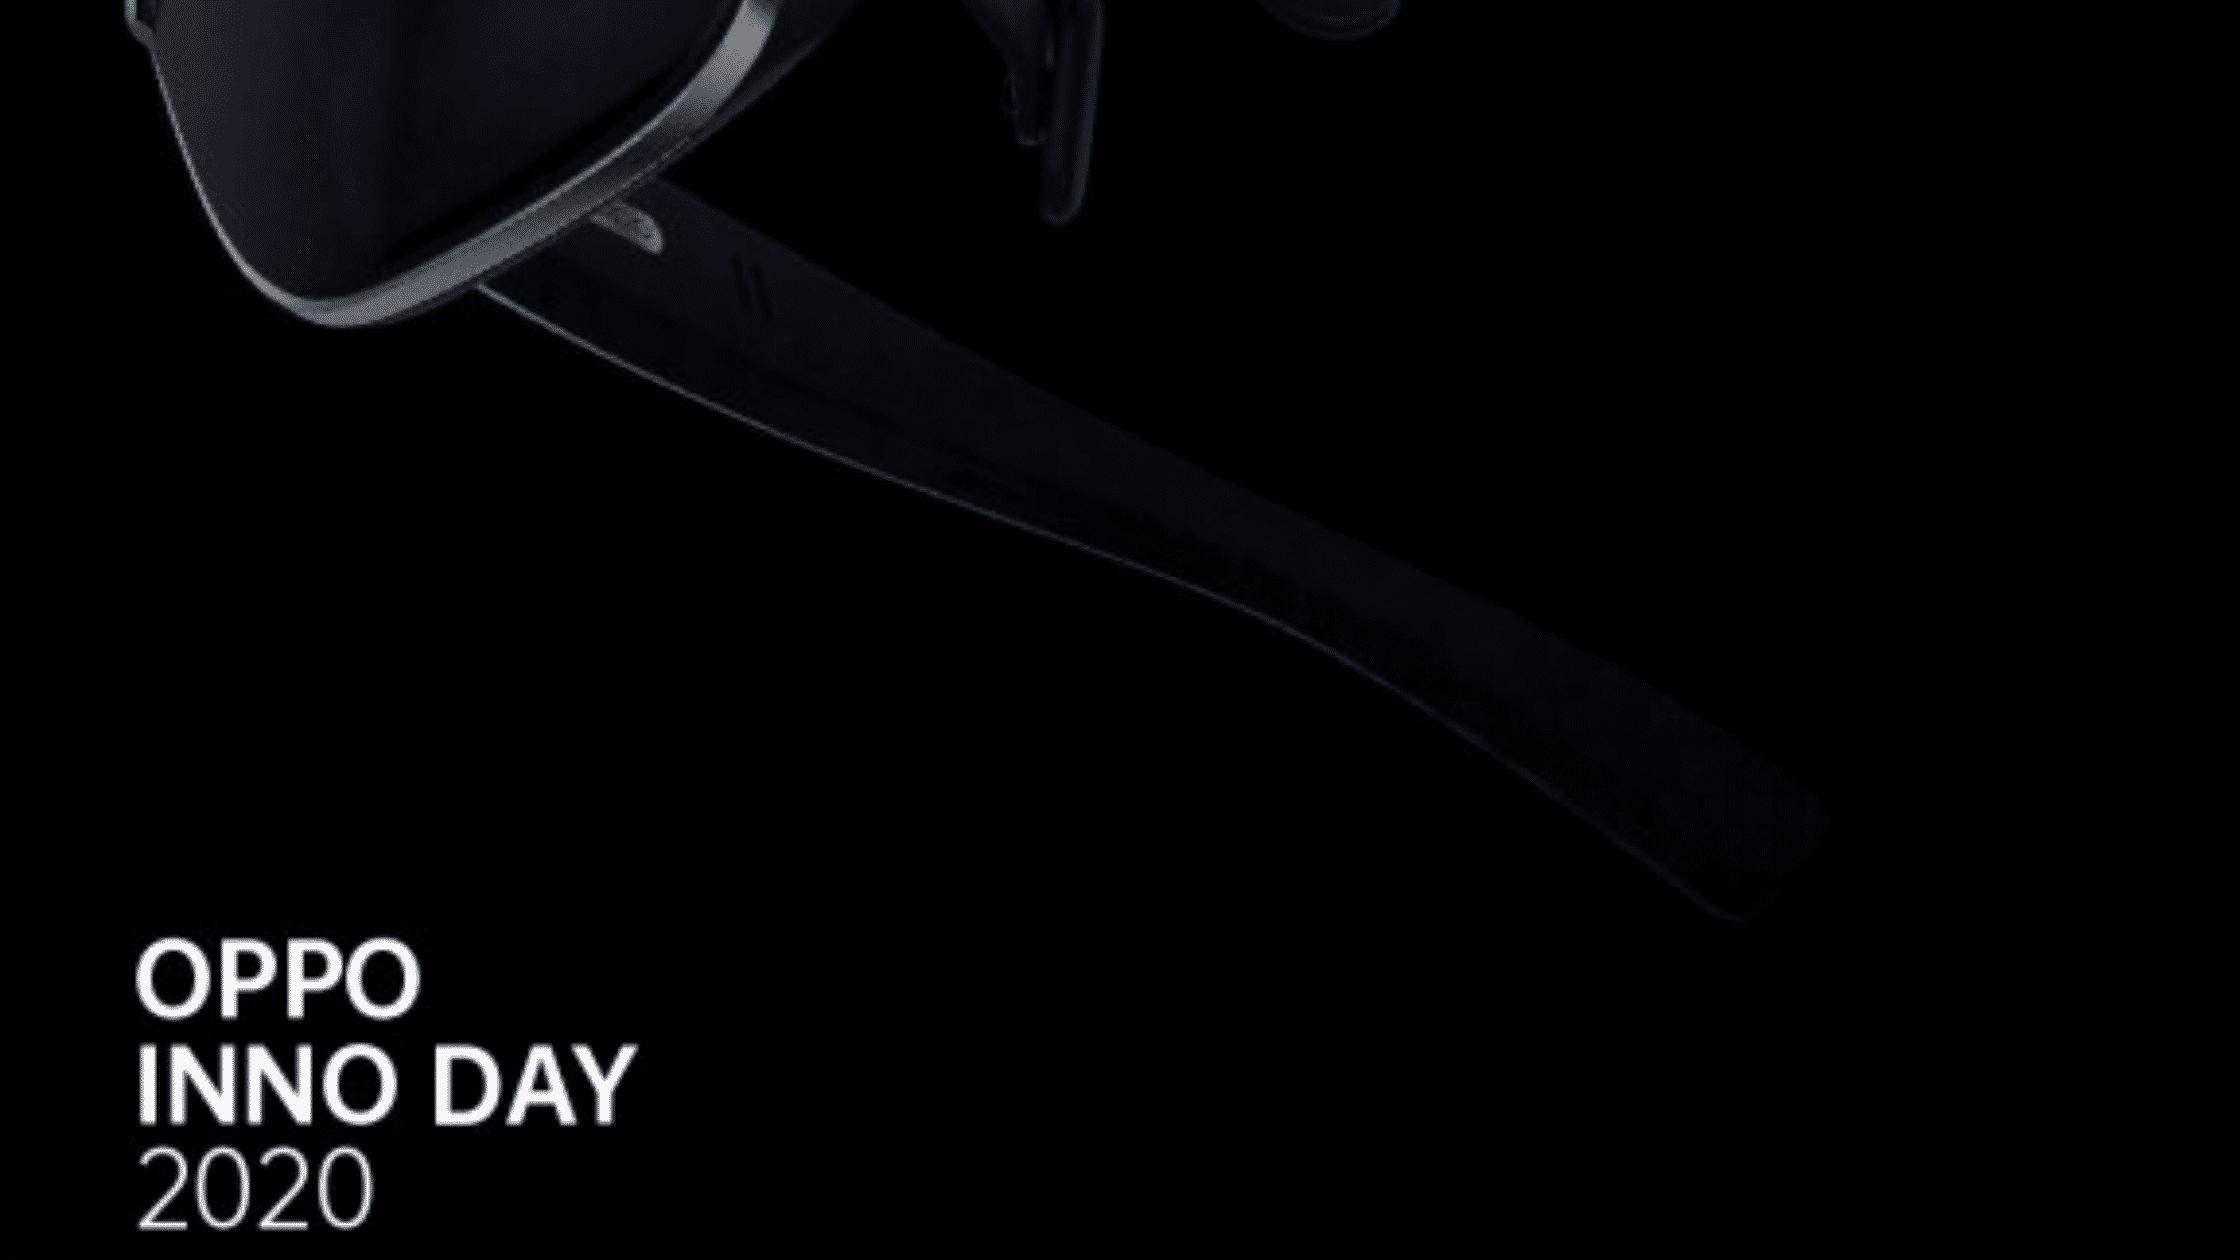 OPPO Akan Rilis Kacamata AR di Ajang INNO Day 2020